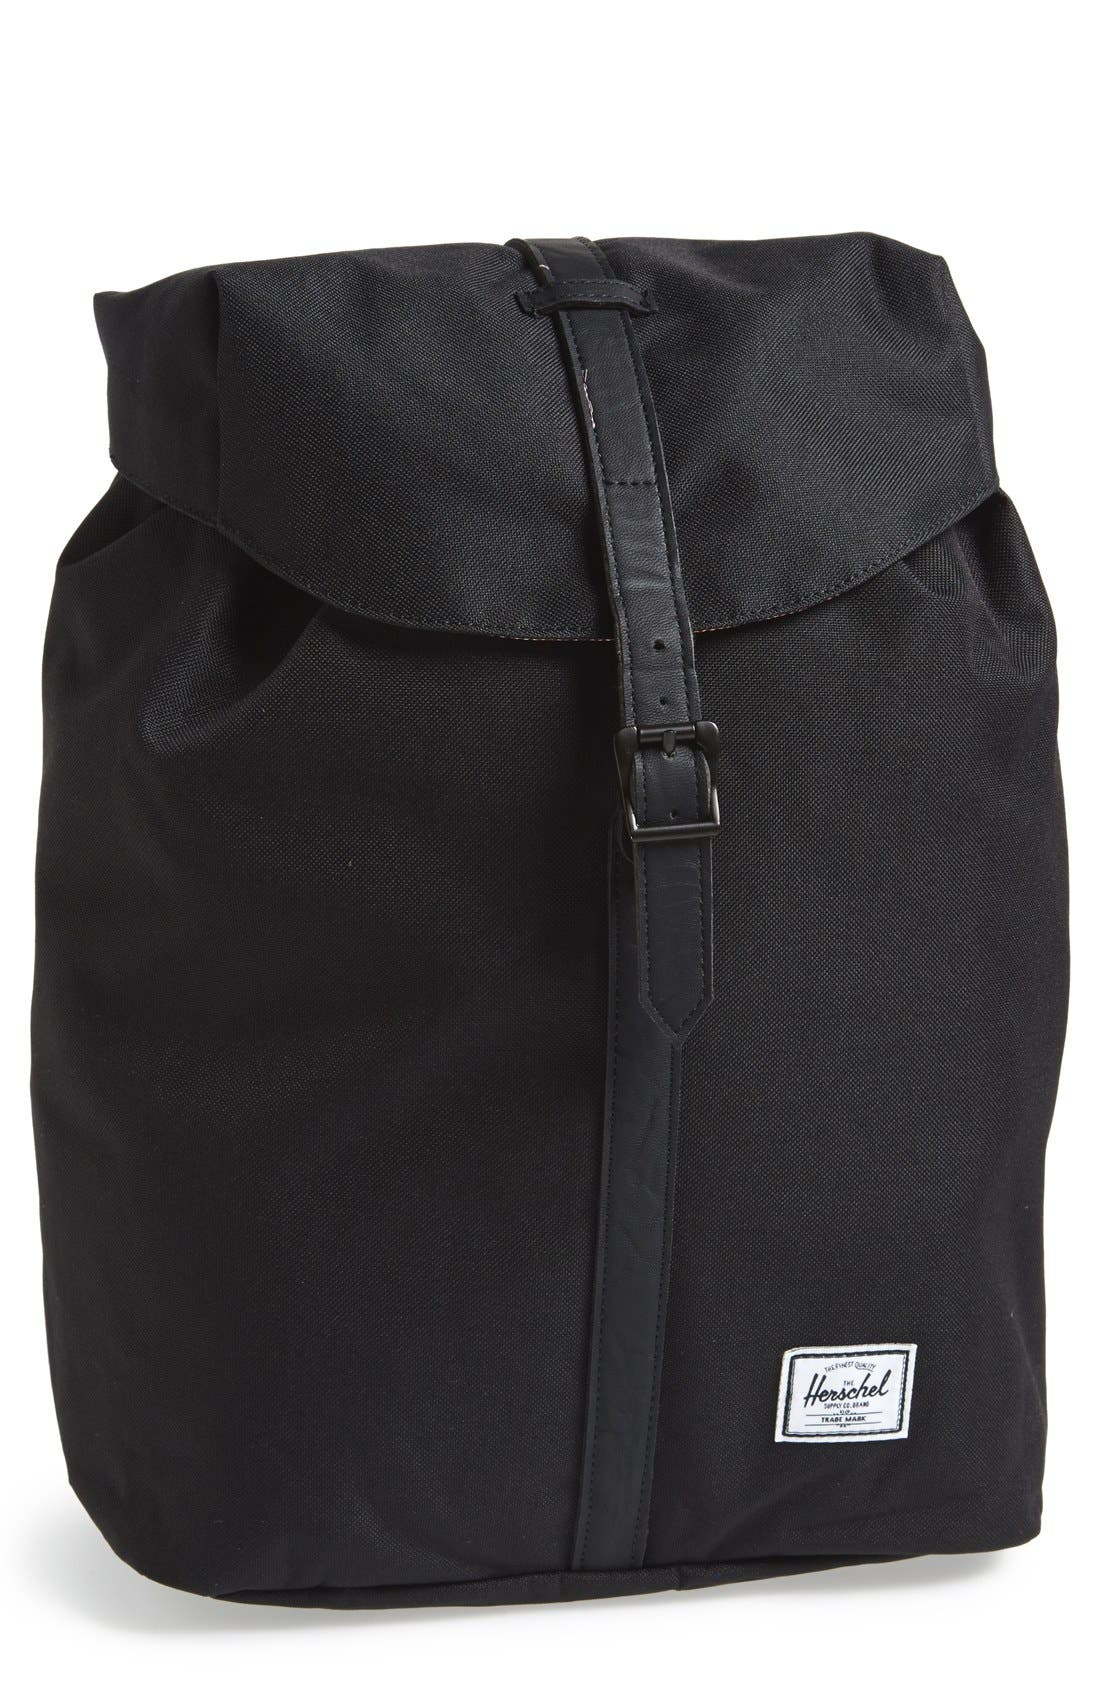 Alternate Image 1 Selected - Herschel Supply Co. 'Post' Backpack (Nordstrom Exclusive)